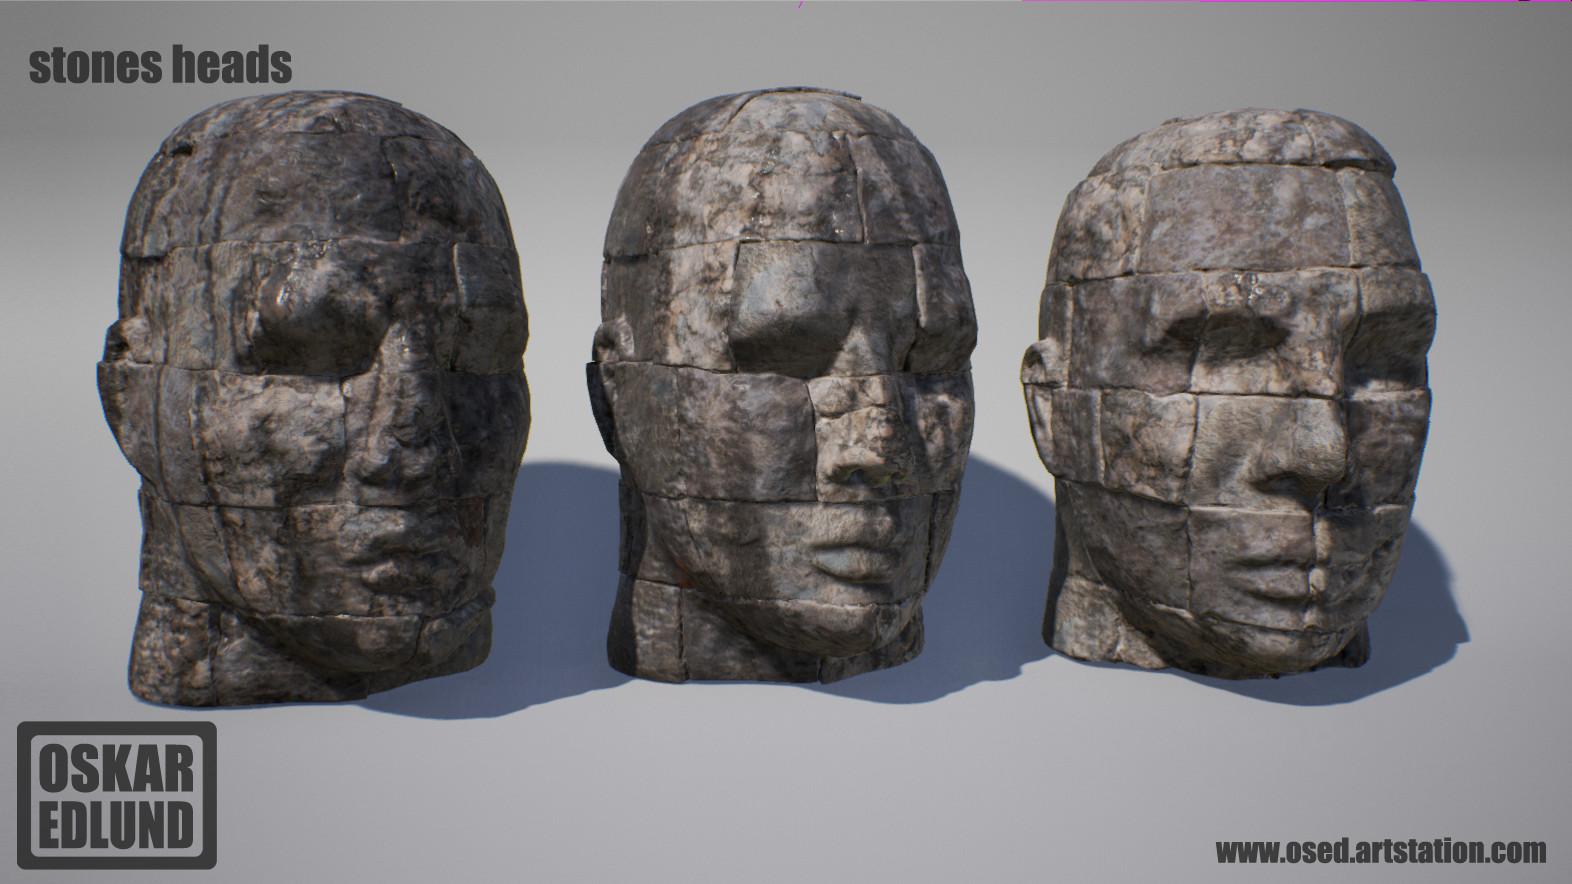 Oskar edlund stoneheads